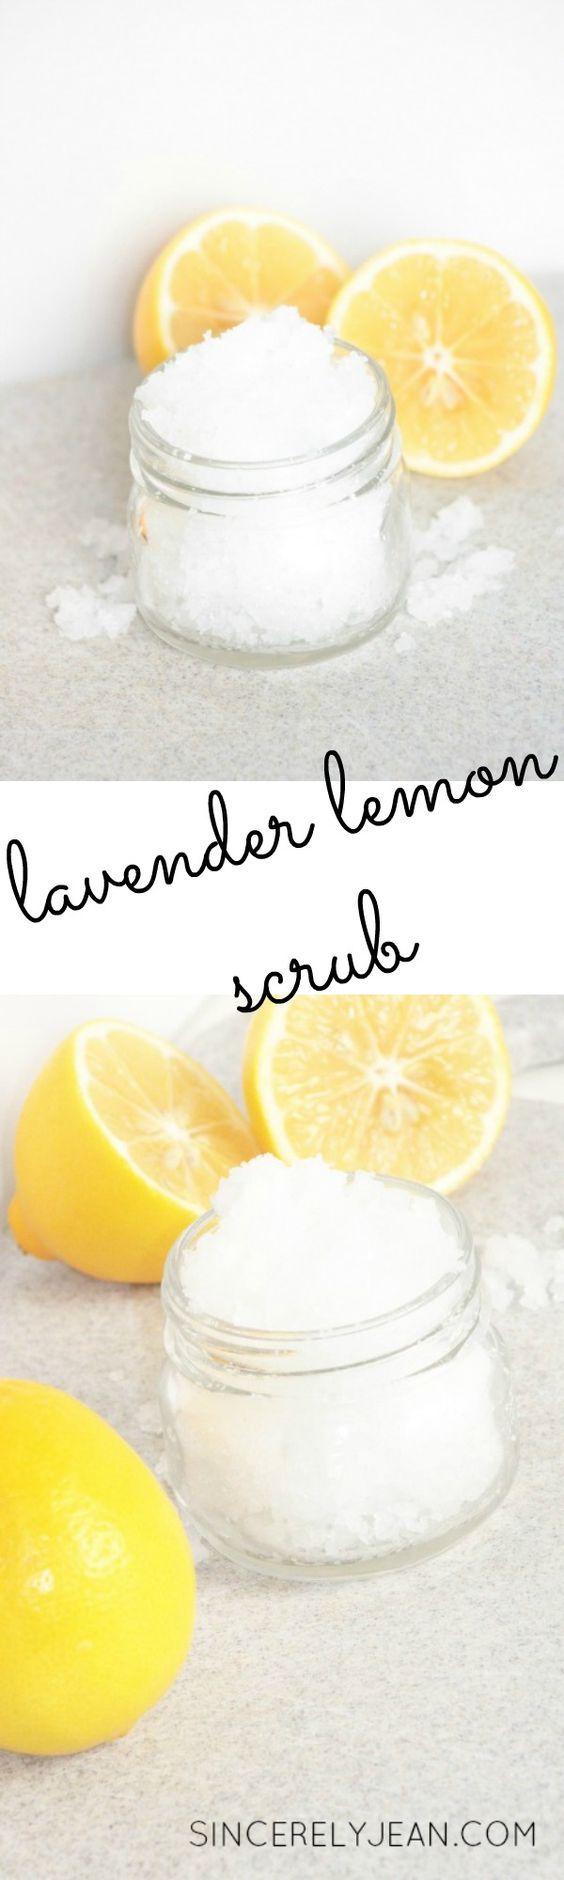 Lavender Lemon Salt Scrub - Step by step tutorial on how to make your own salt scrub   www.sincerelyjean.com